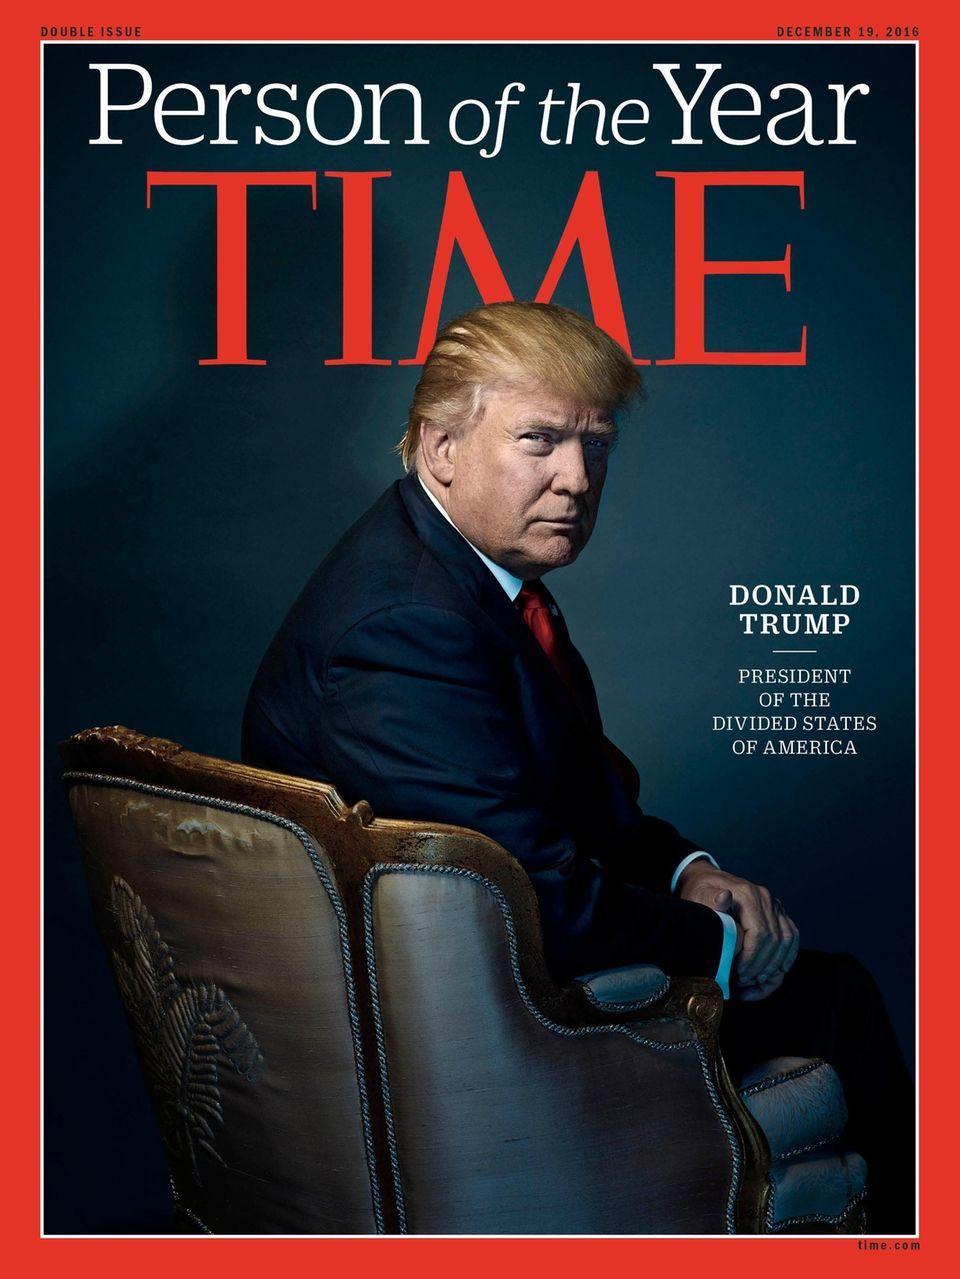 2016: U.S. President-elect Donald Trump